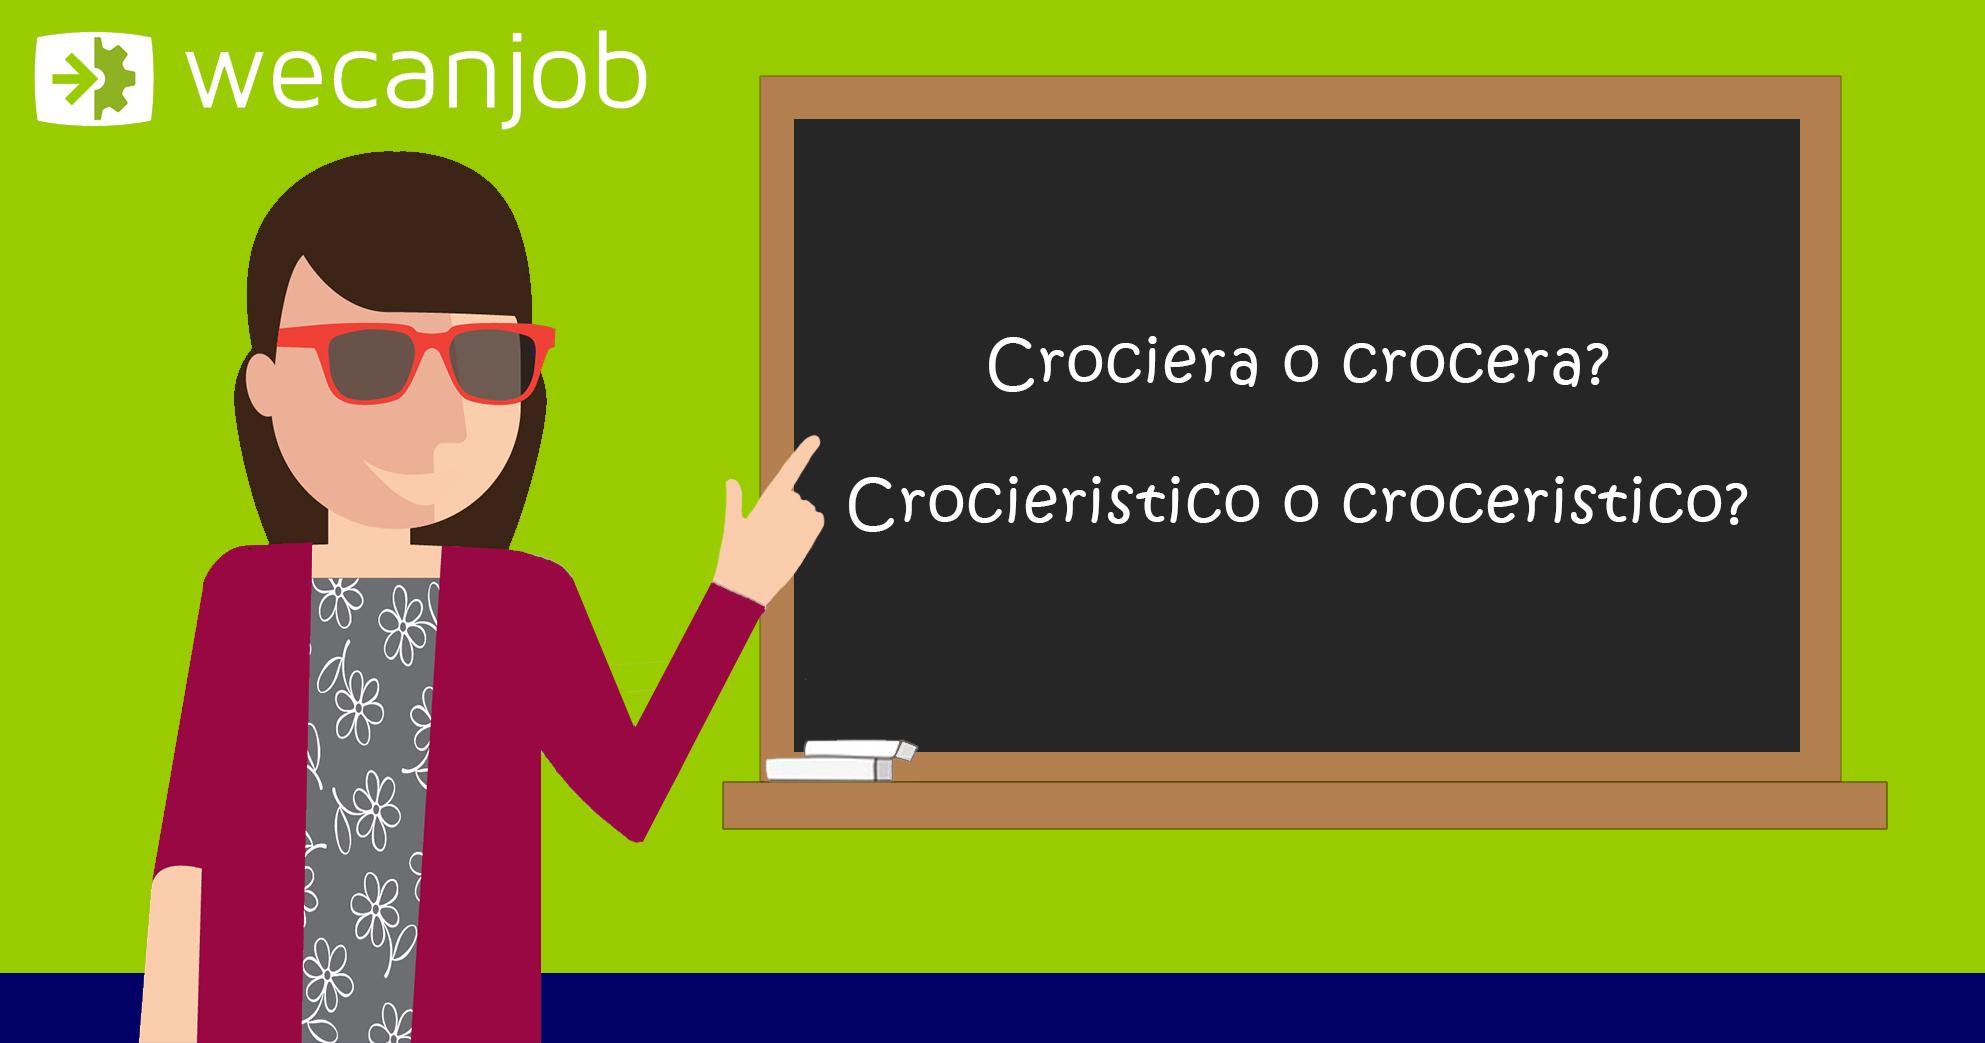 Si scrive crocera o crociera? Croceristico o crocieristico?